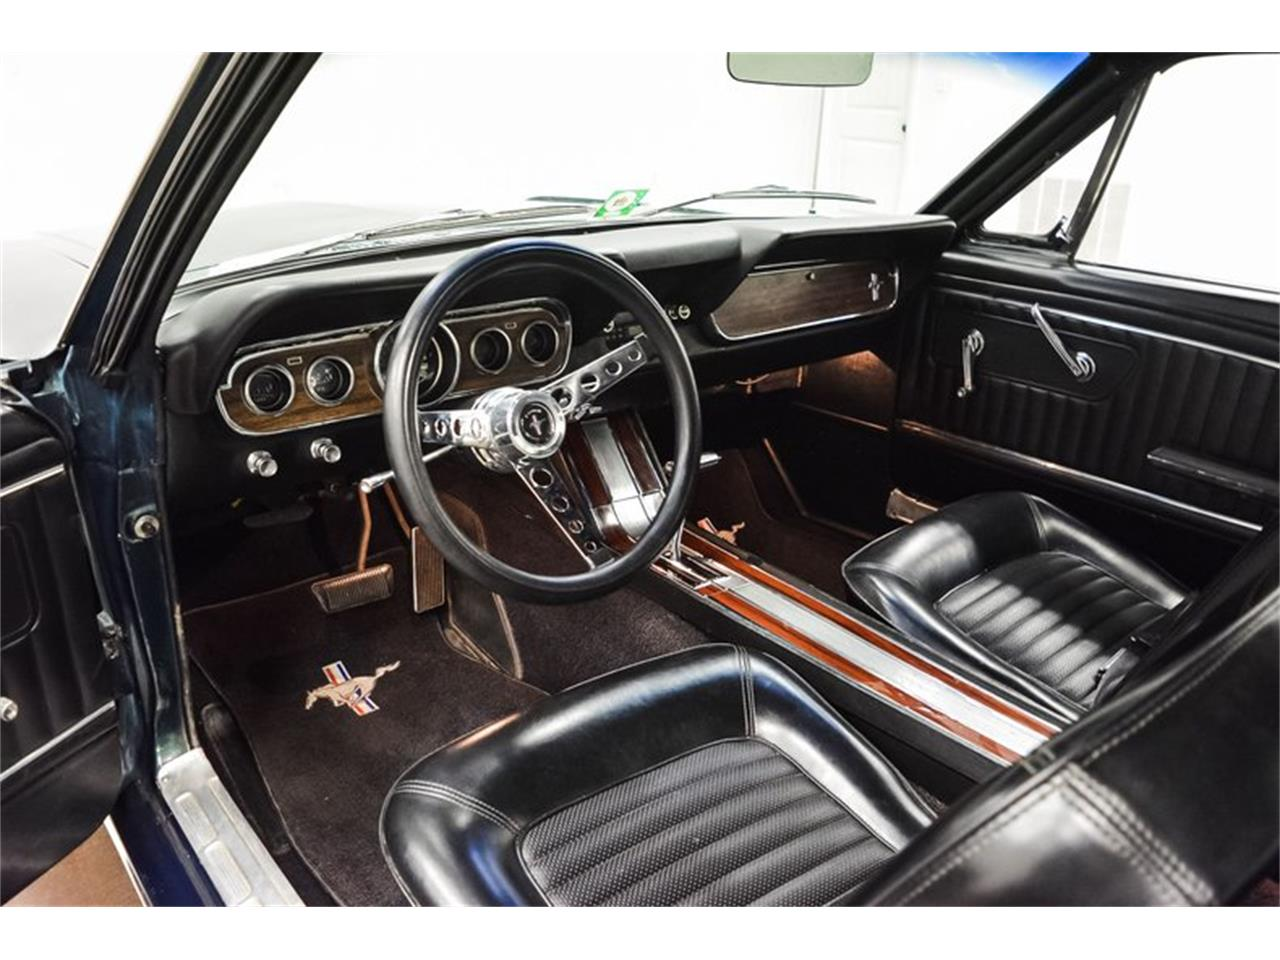 Ford Mustang V8 1966 prix tout compris